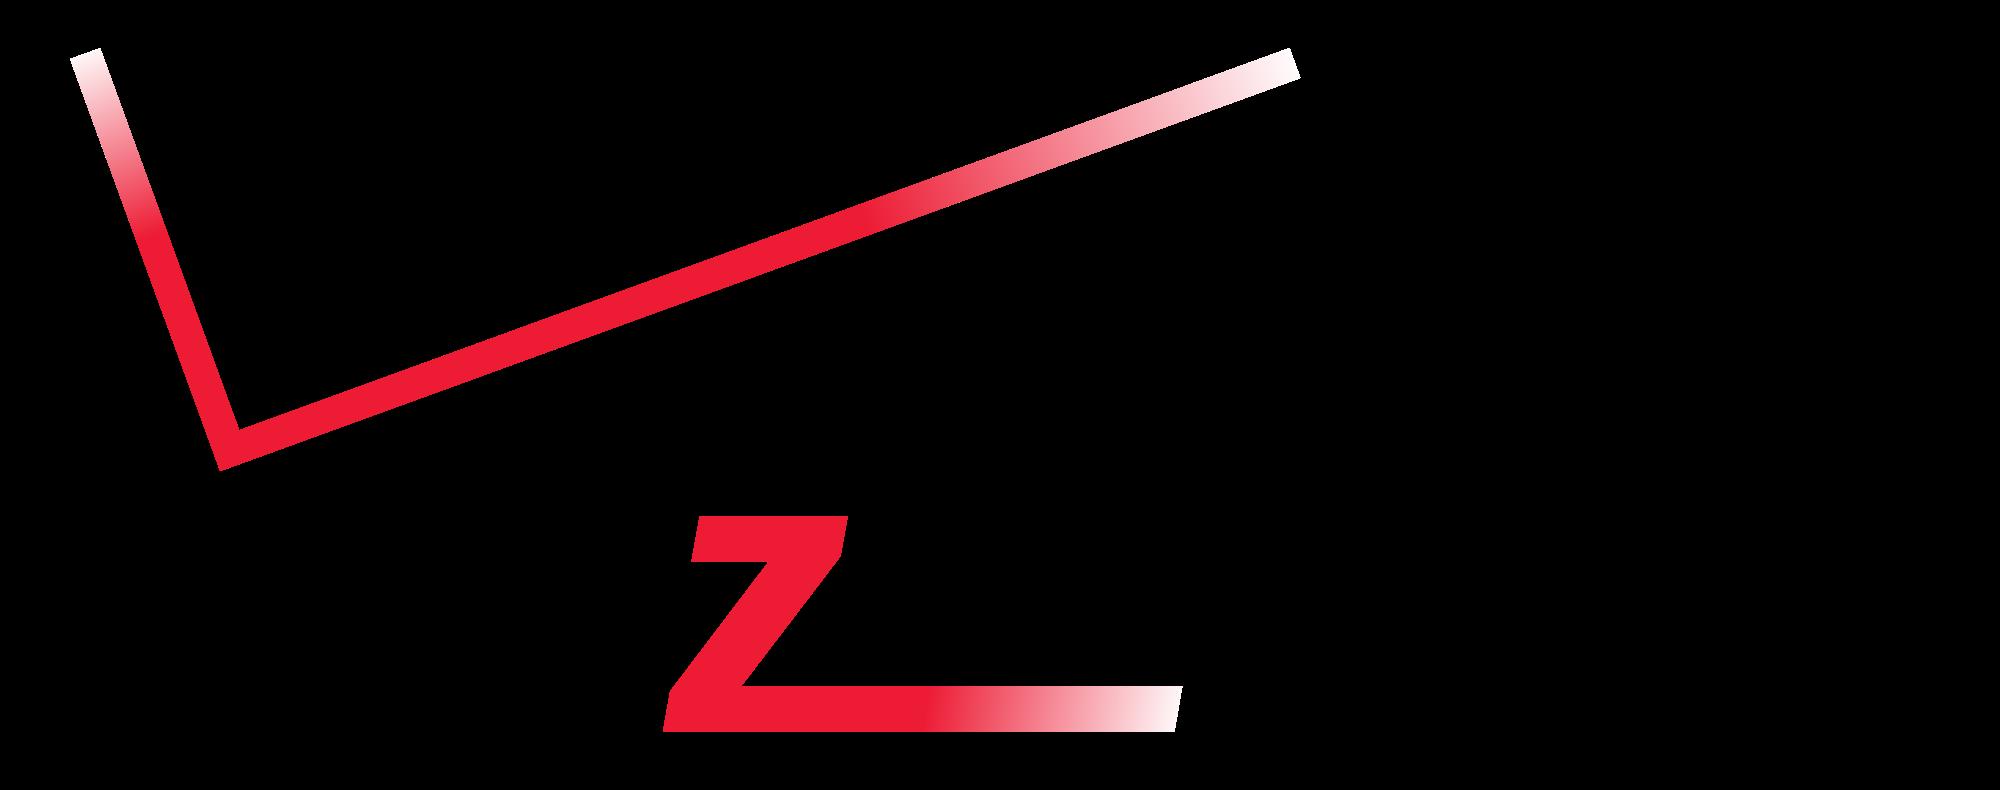 Verizon 2015 Logo Vector PNG - 38574